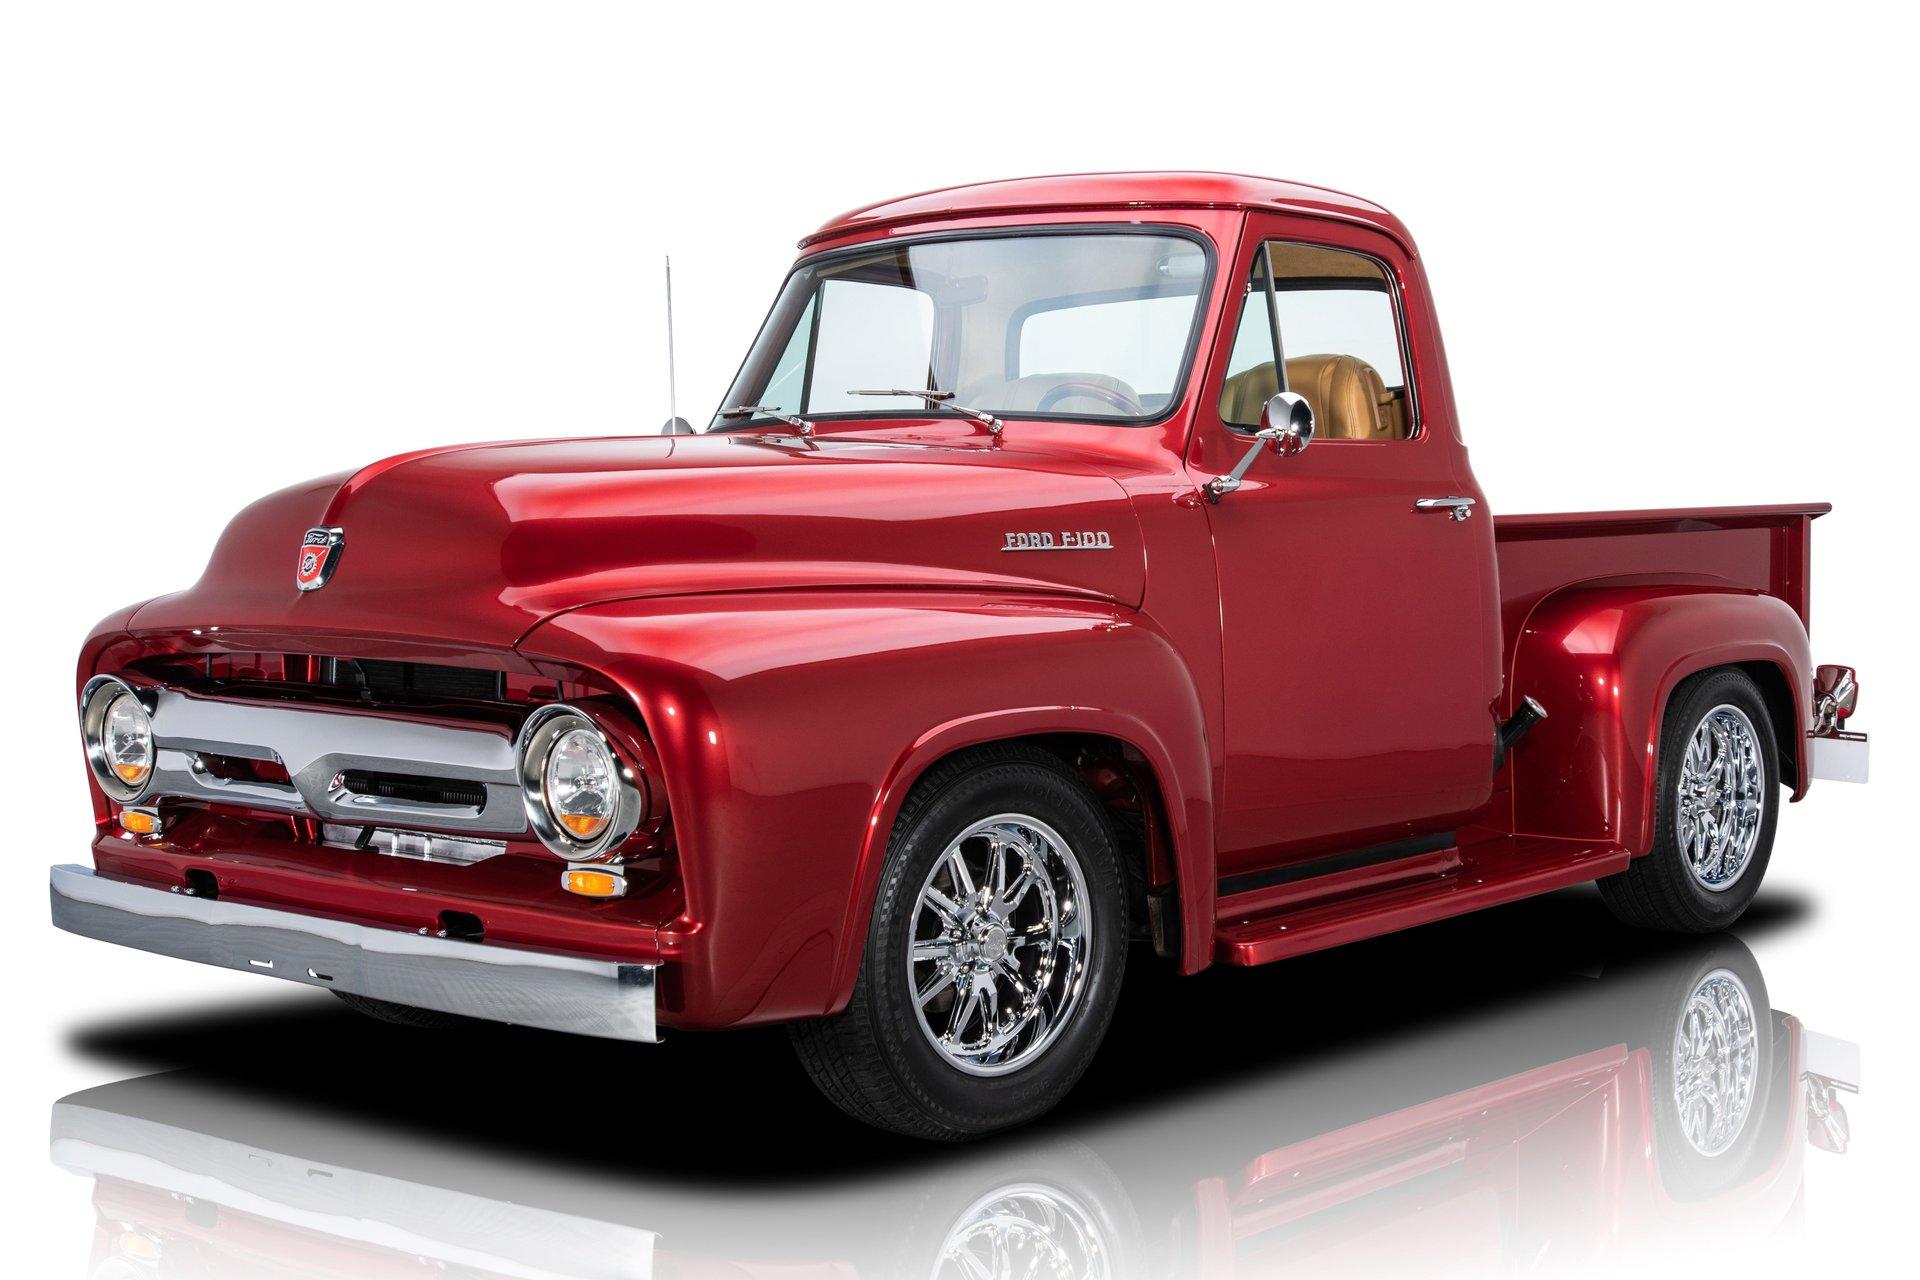 1953 ford f100 pickup truck